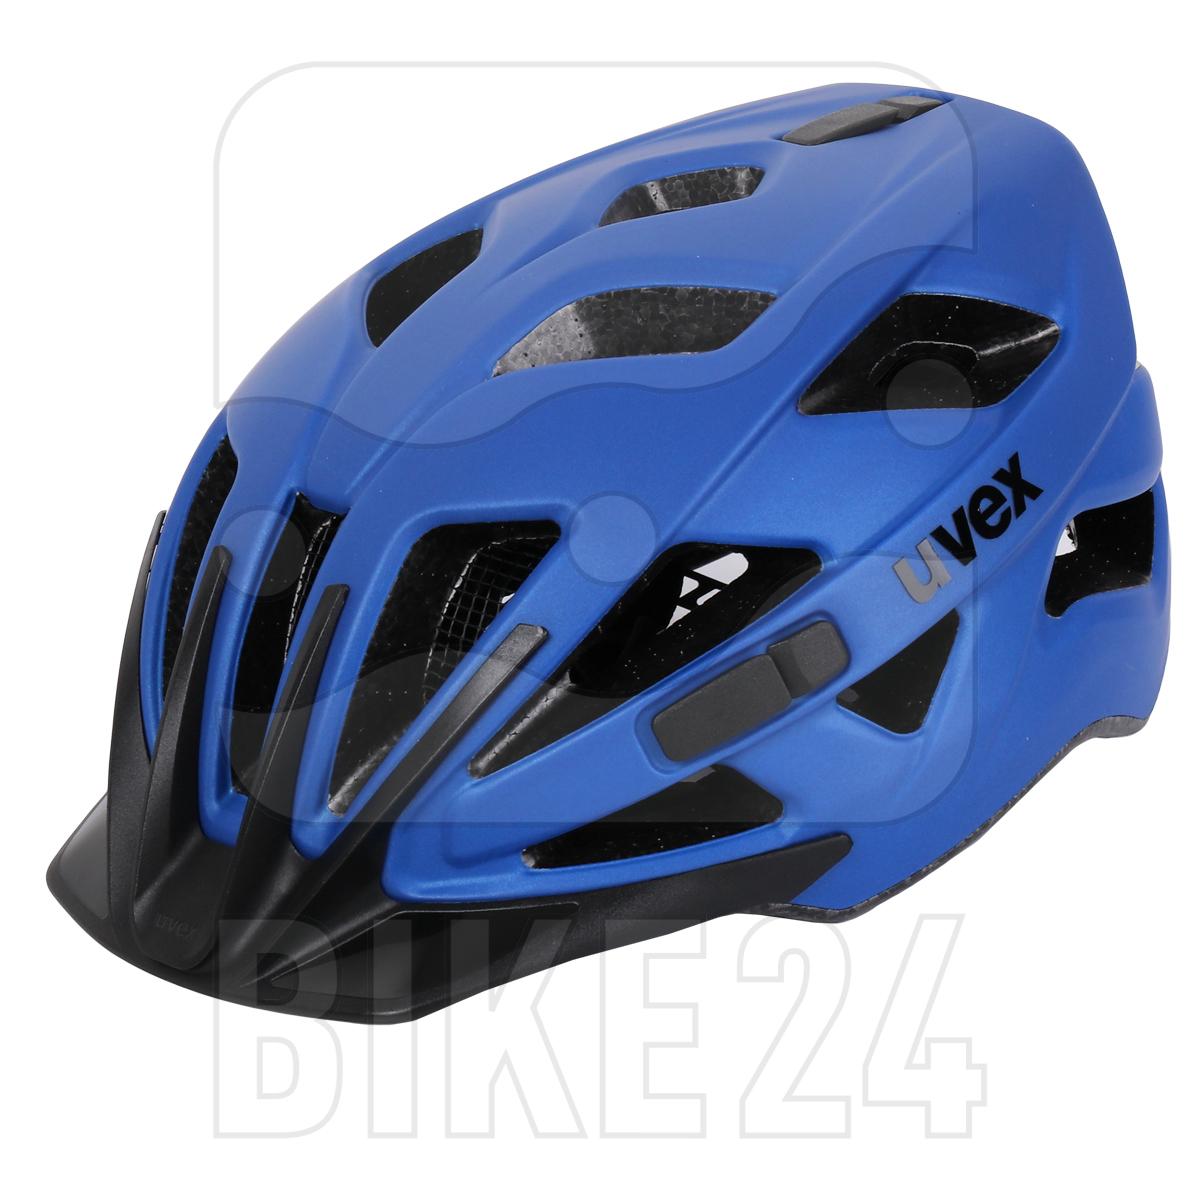 Uvex touring cc Helm - blue mat